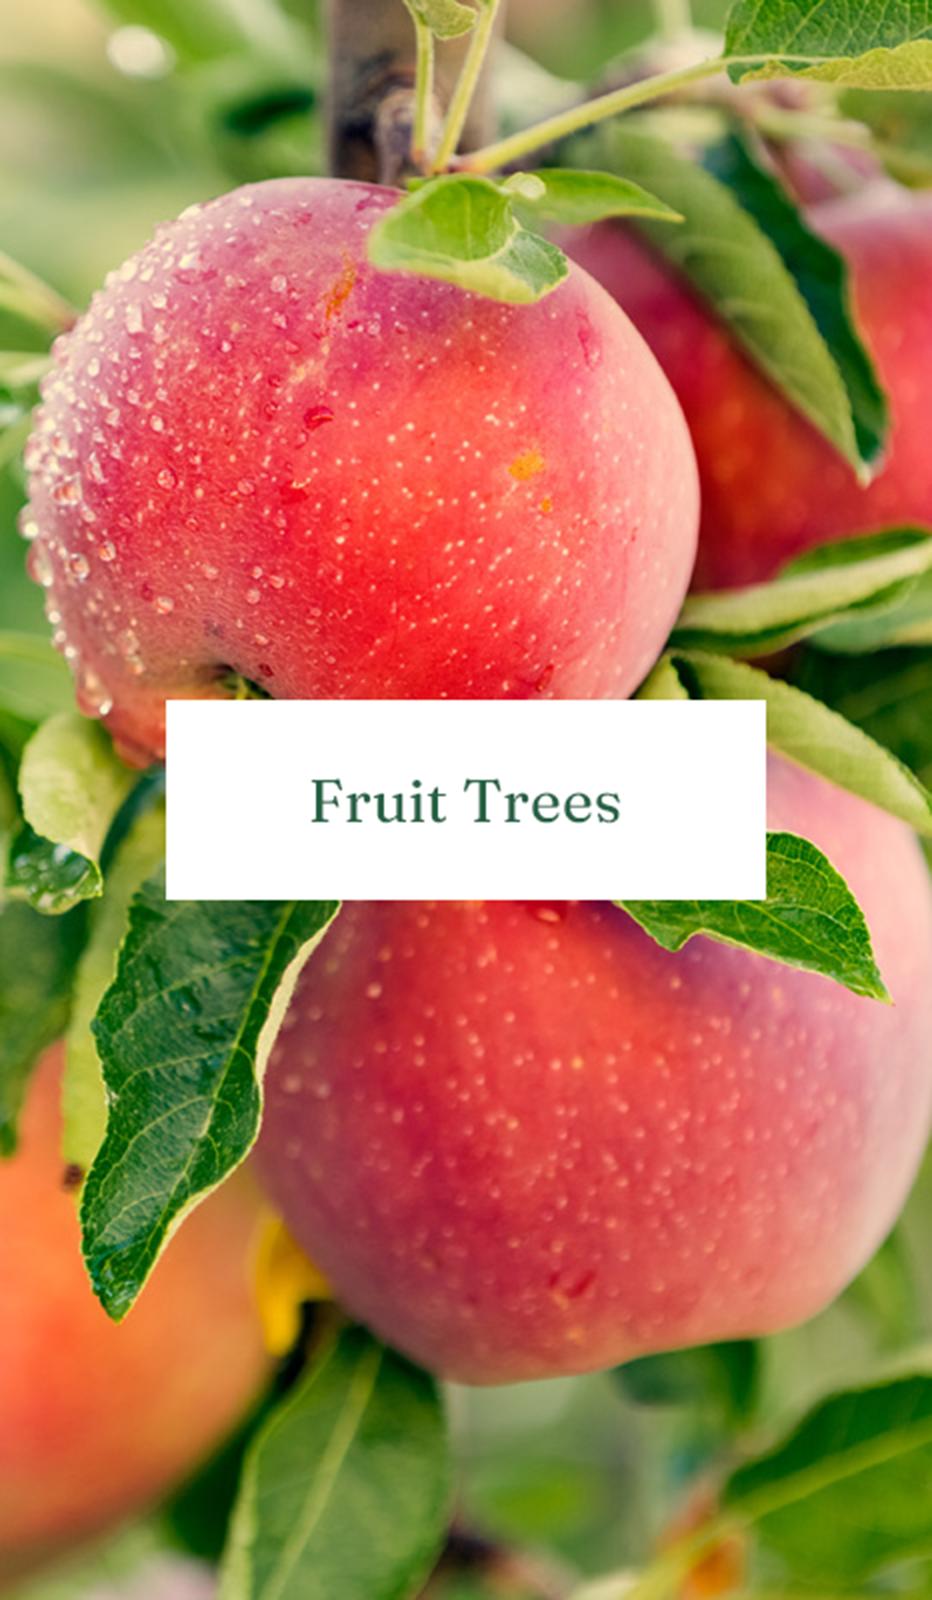 Fruit Trees Mobile